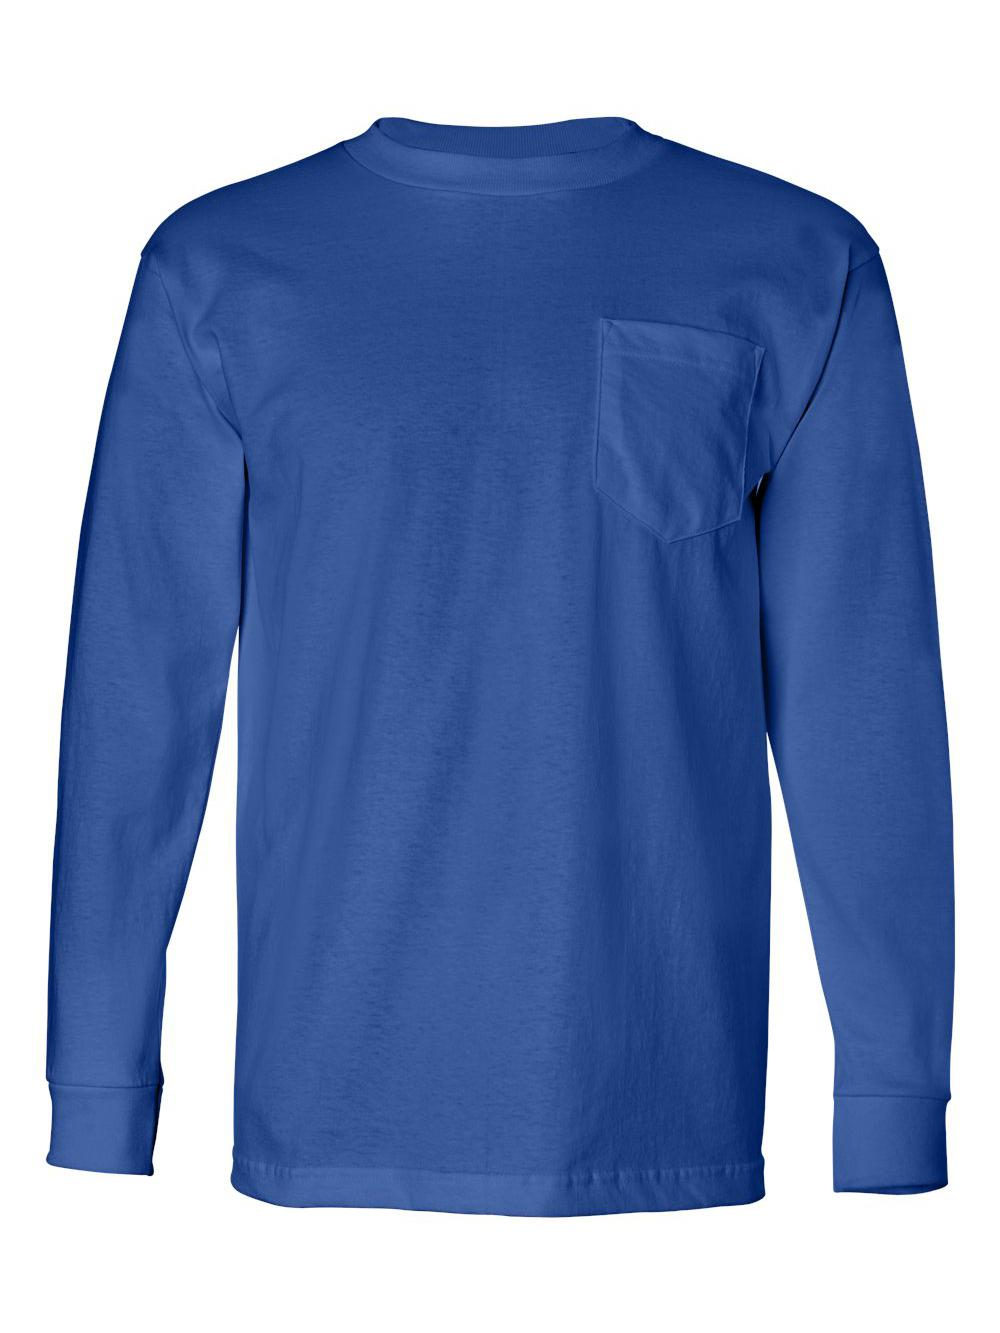 Bayside-USA-Made-Long-Sleeve-T-Shirt-with-a-Pocket-8100 thumbnail 21